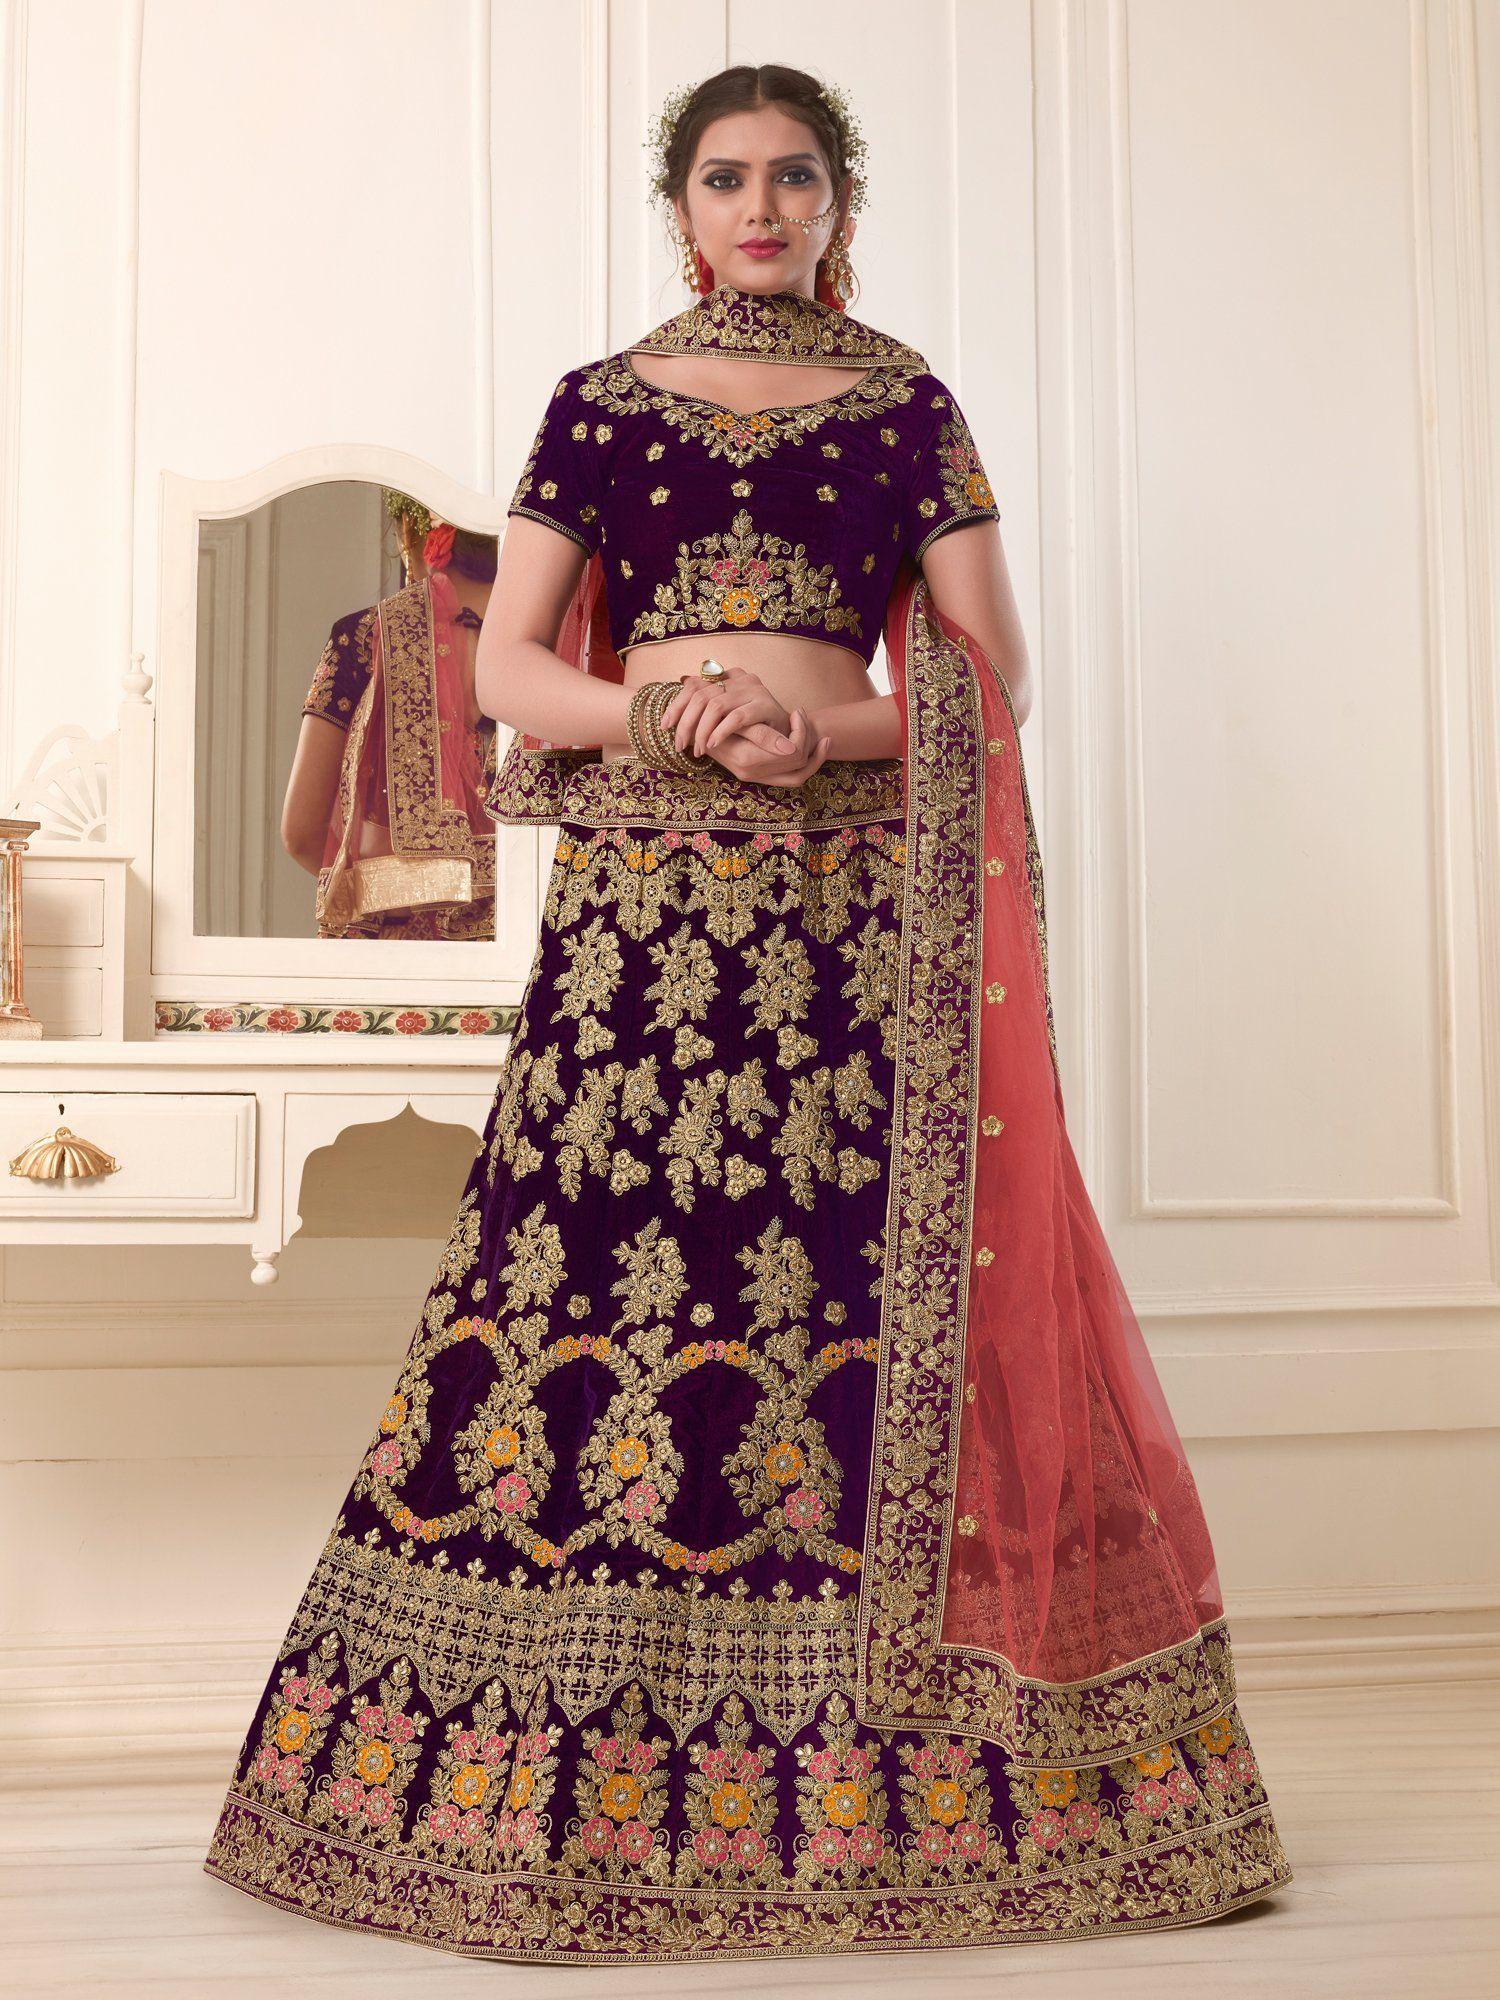 d75c4bad3b Buy Purple Color Pure Two Tone Velvet Semi Stitched Lehenga | Zinnga  ✓️Whatsapp: +91 9246261661 #lehenga #lehengacholi #fashion #wedding  #indianfashion ...